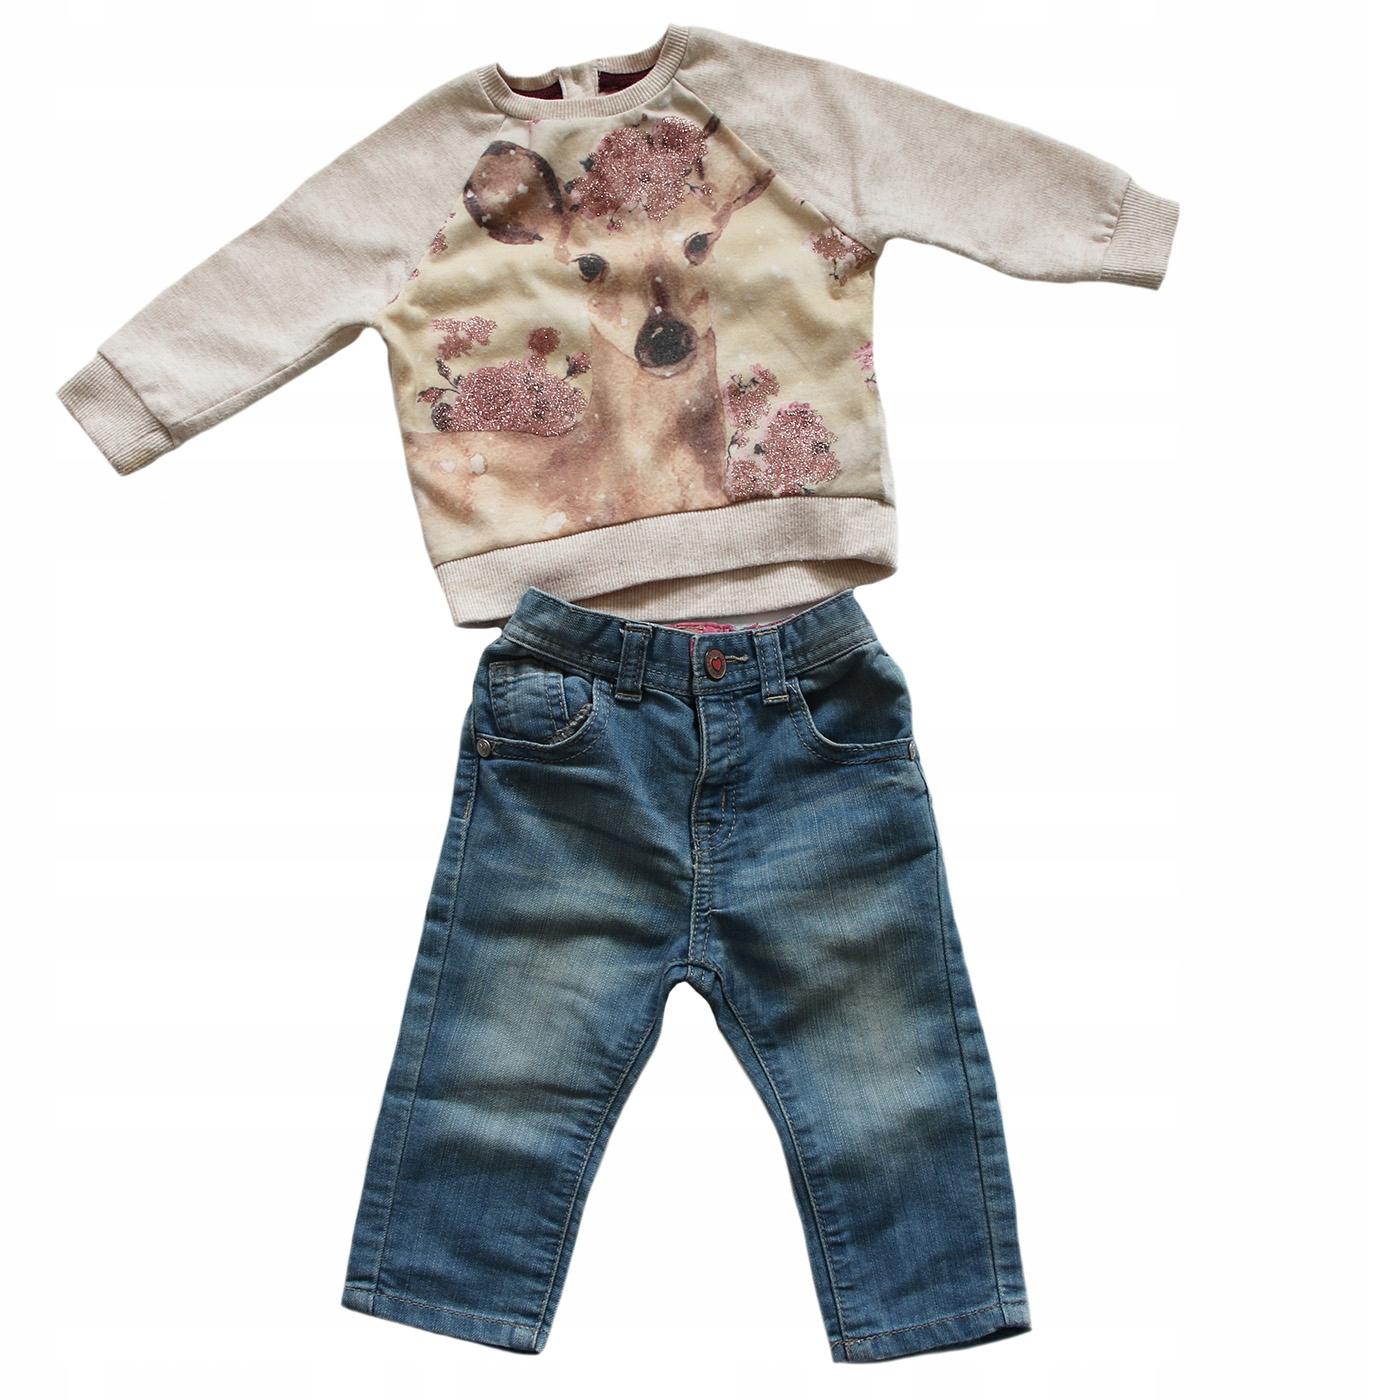 Jeansy Mothercare + bluza z sarną F&F 6-9 mc